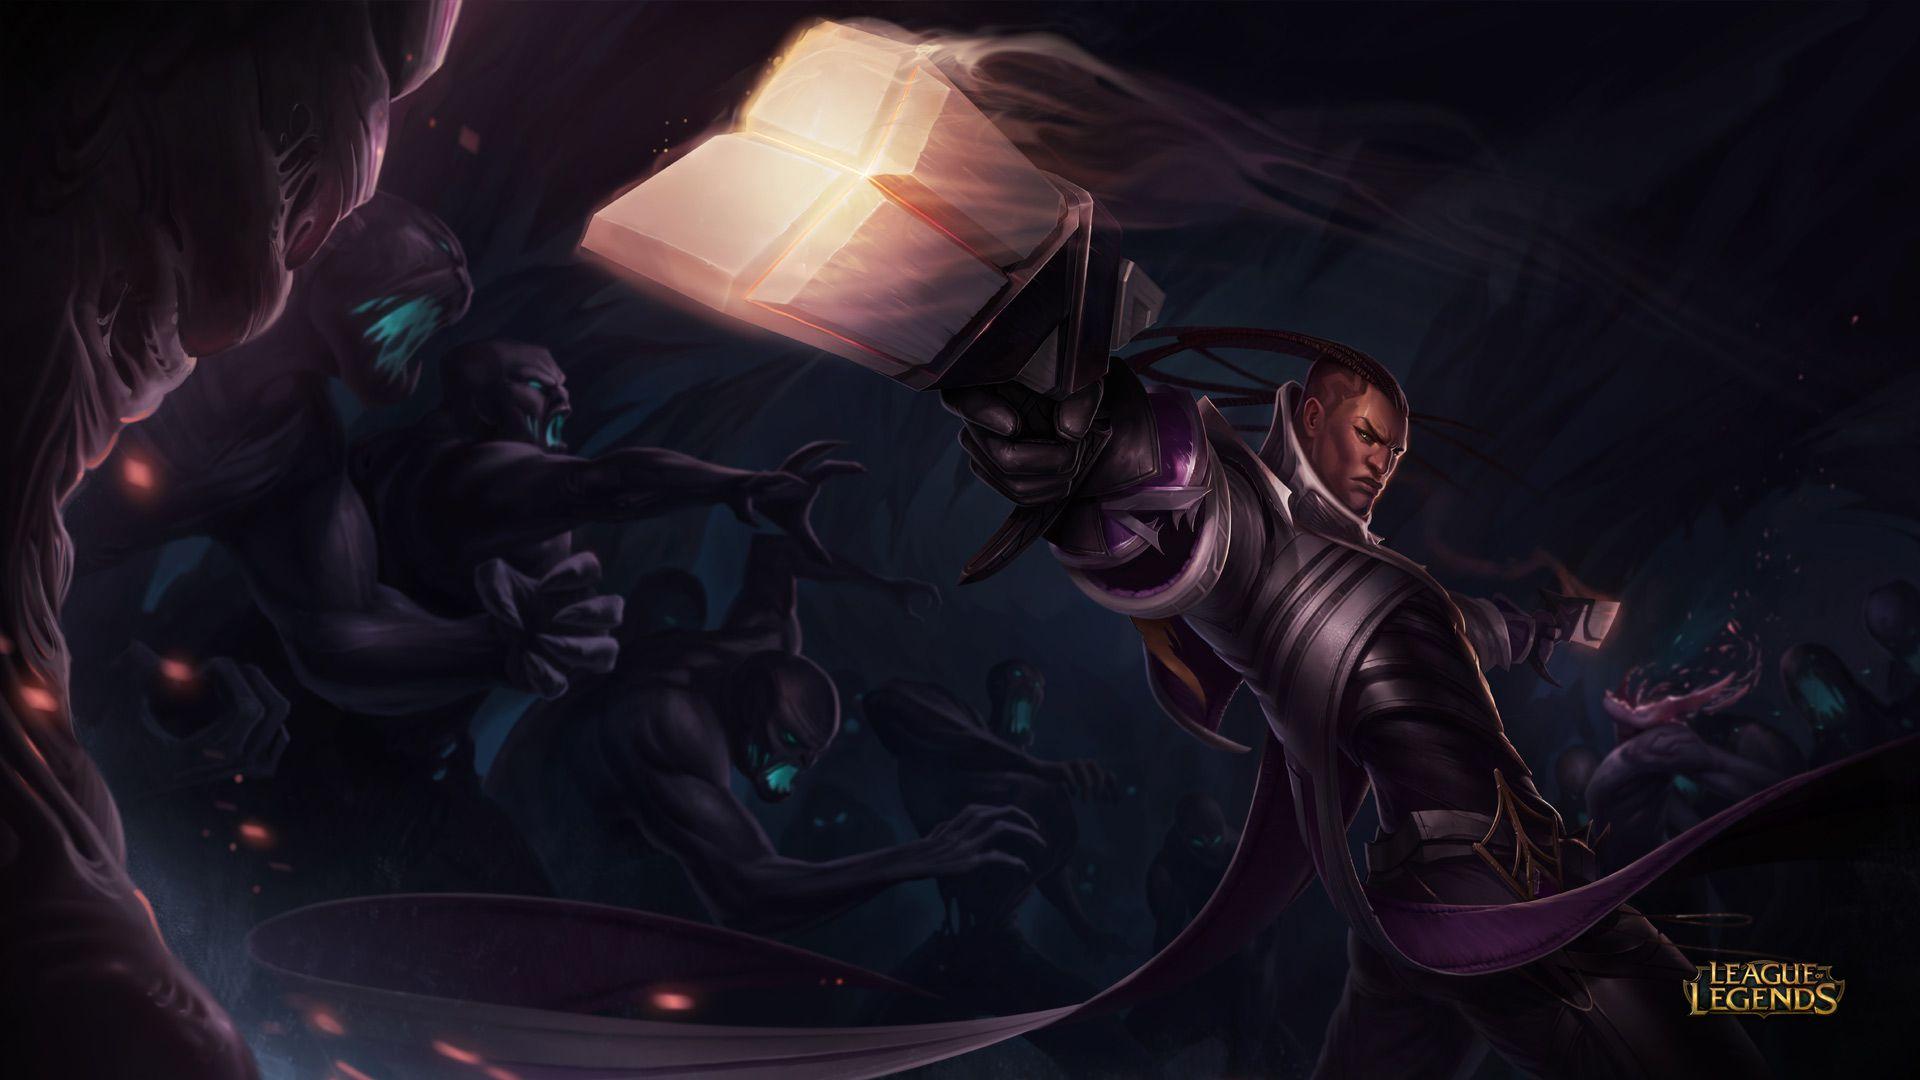 Lucian - League of Legends Wallpapers